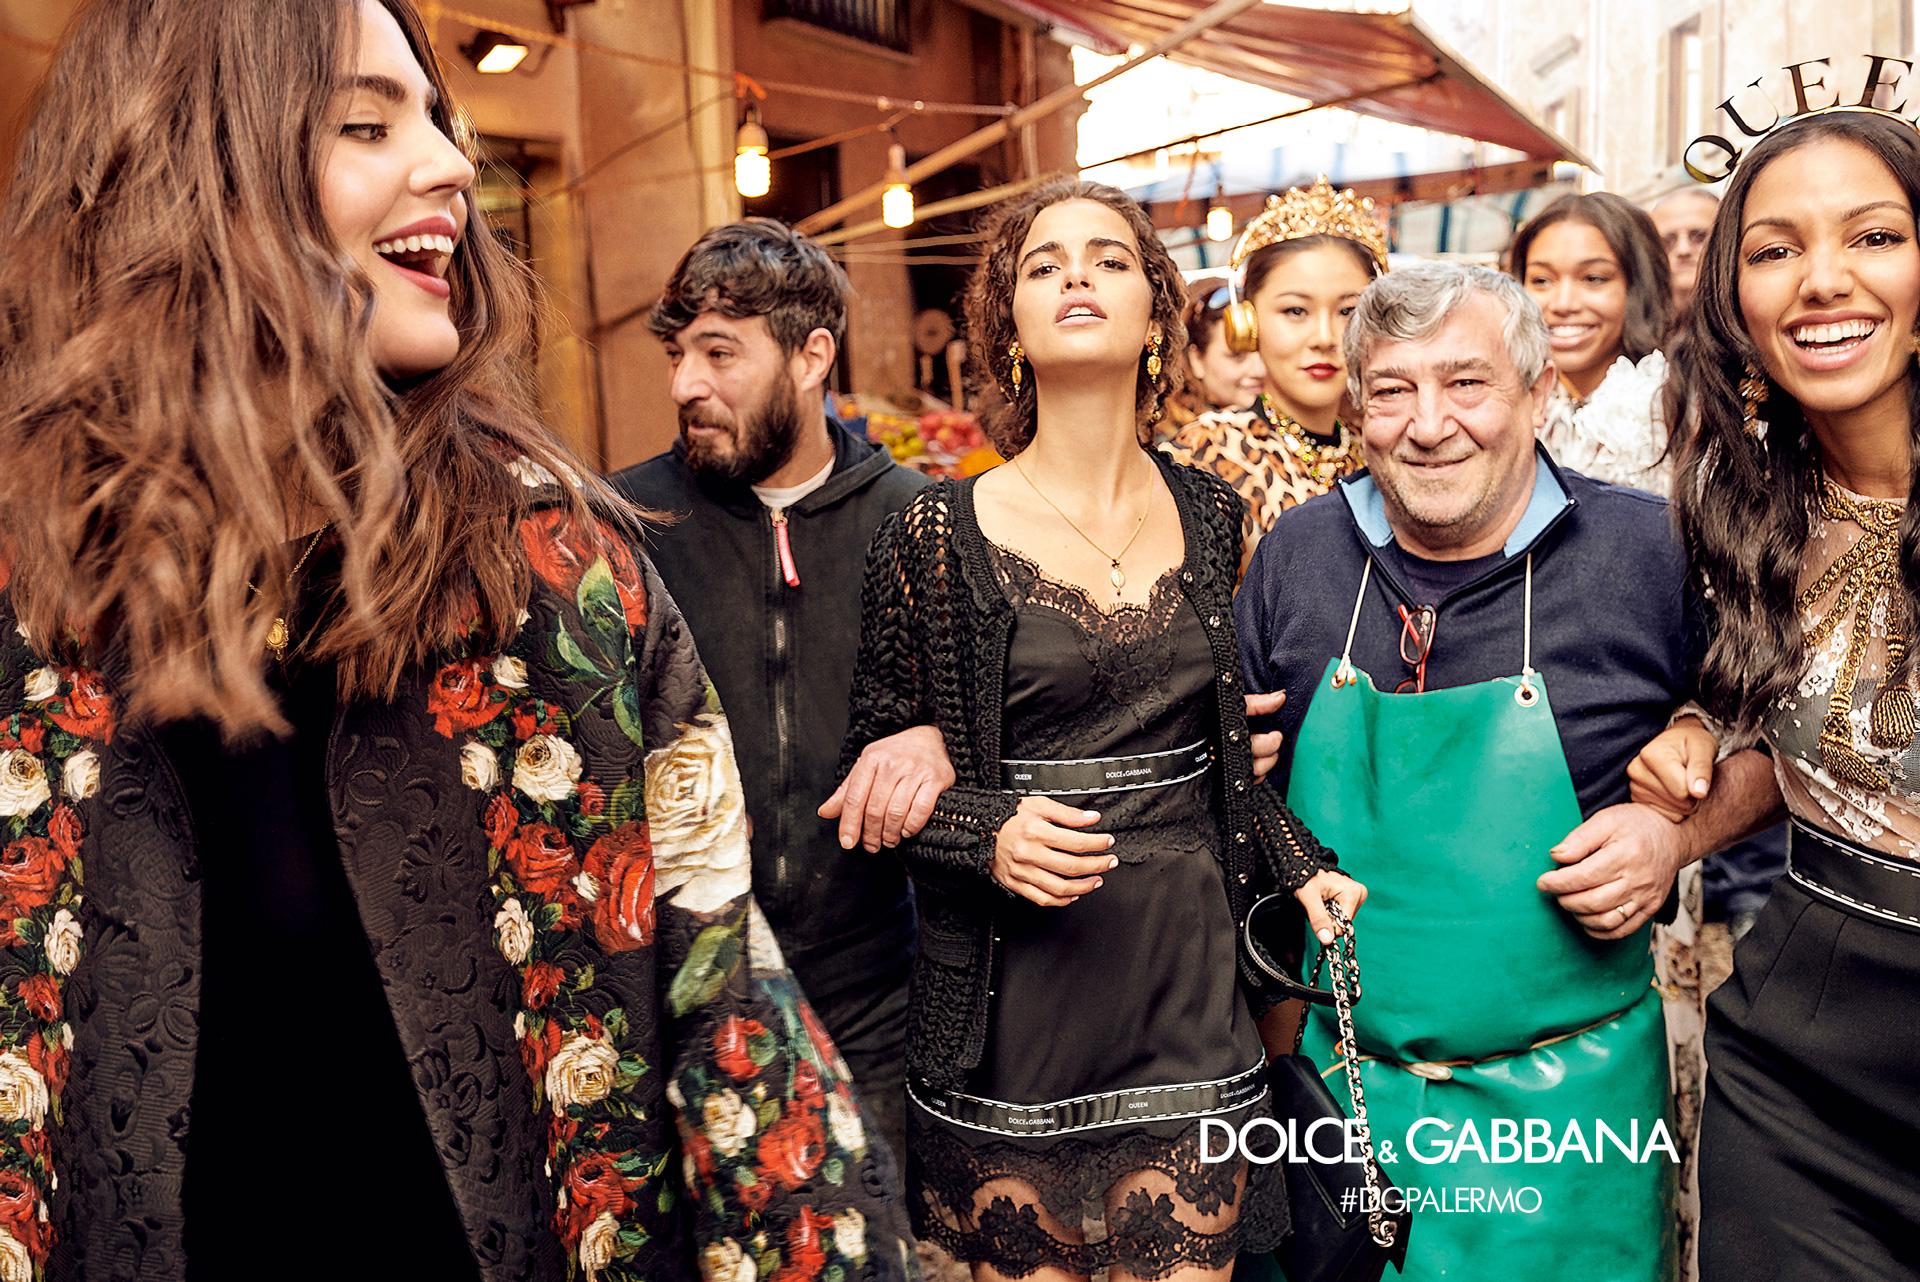 a71cafa3 Designers | Domenico Dolce & Stefano Gabbana Photographer | Luca and  Alessandro Morelli Models | Alessandra Garcia, Amelia Windsor, Brandon  Thomas Lee, ...